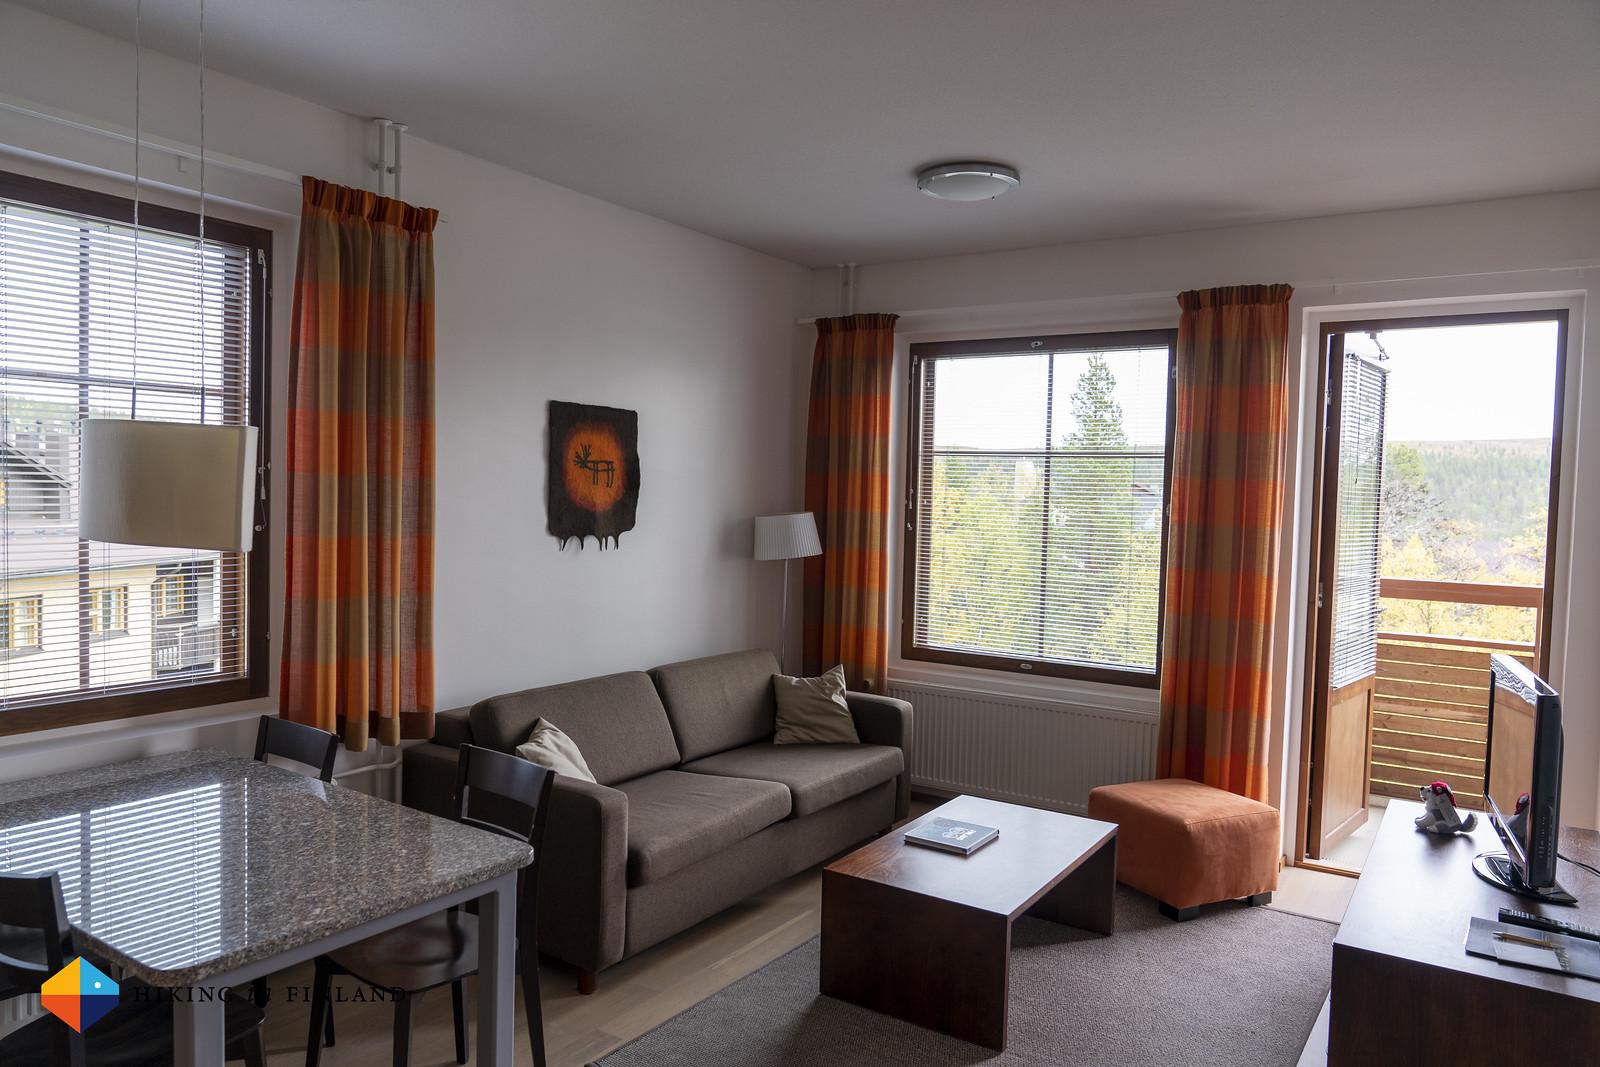 Lapland Hotels Riekonlinna Room